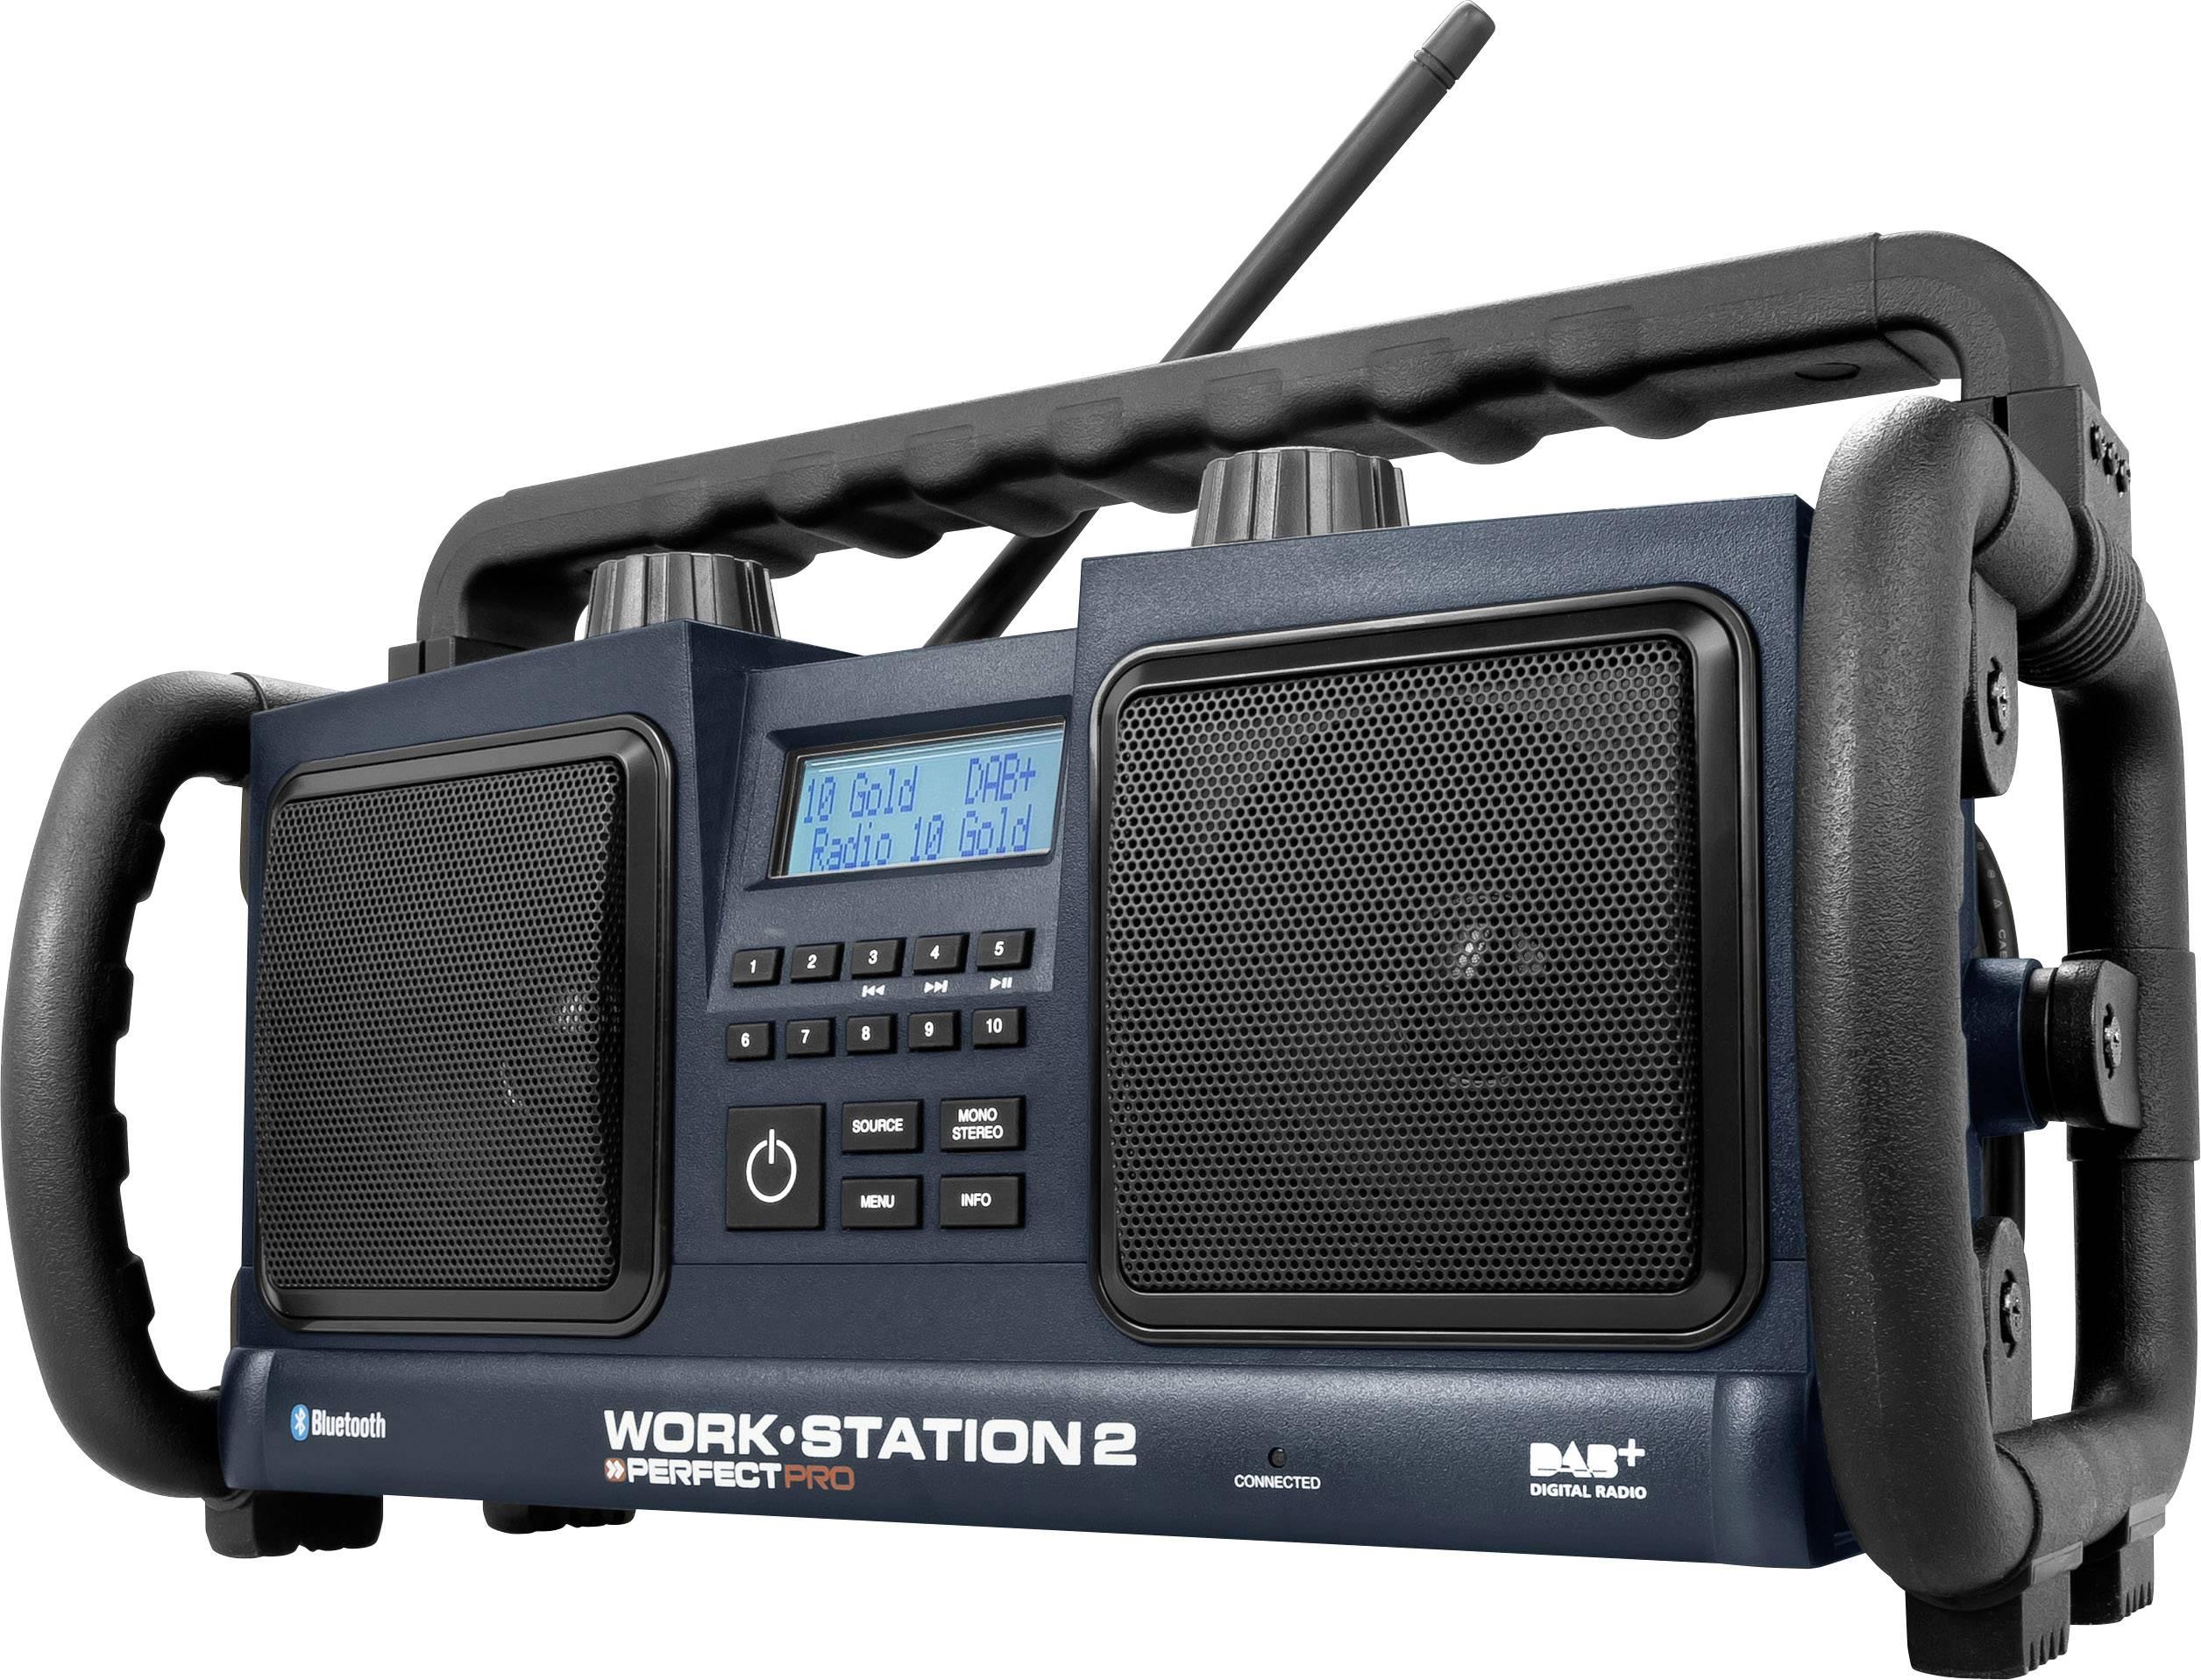 DAB+ outdoorové rádio PerfectPro Workstation 2 AUX, Bluetooth, DAB+, FM, černá